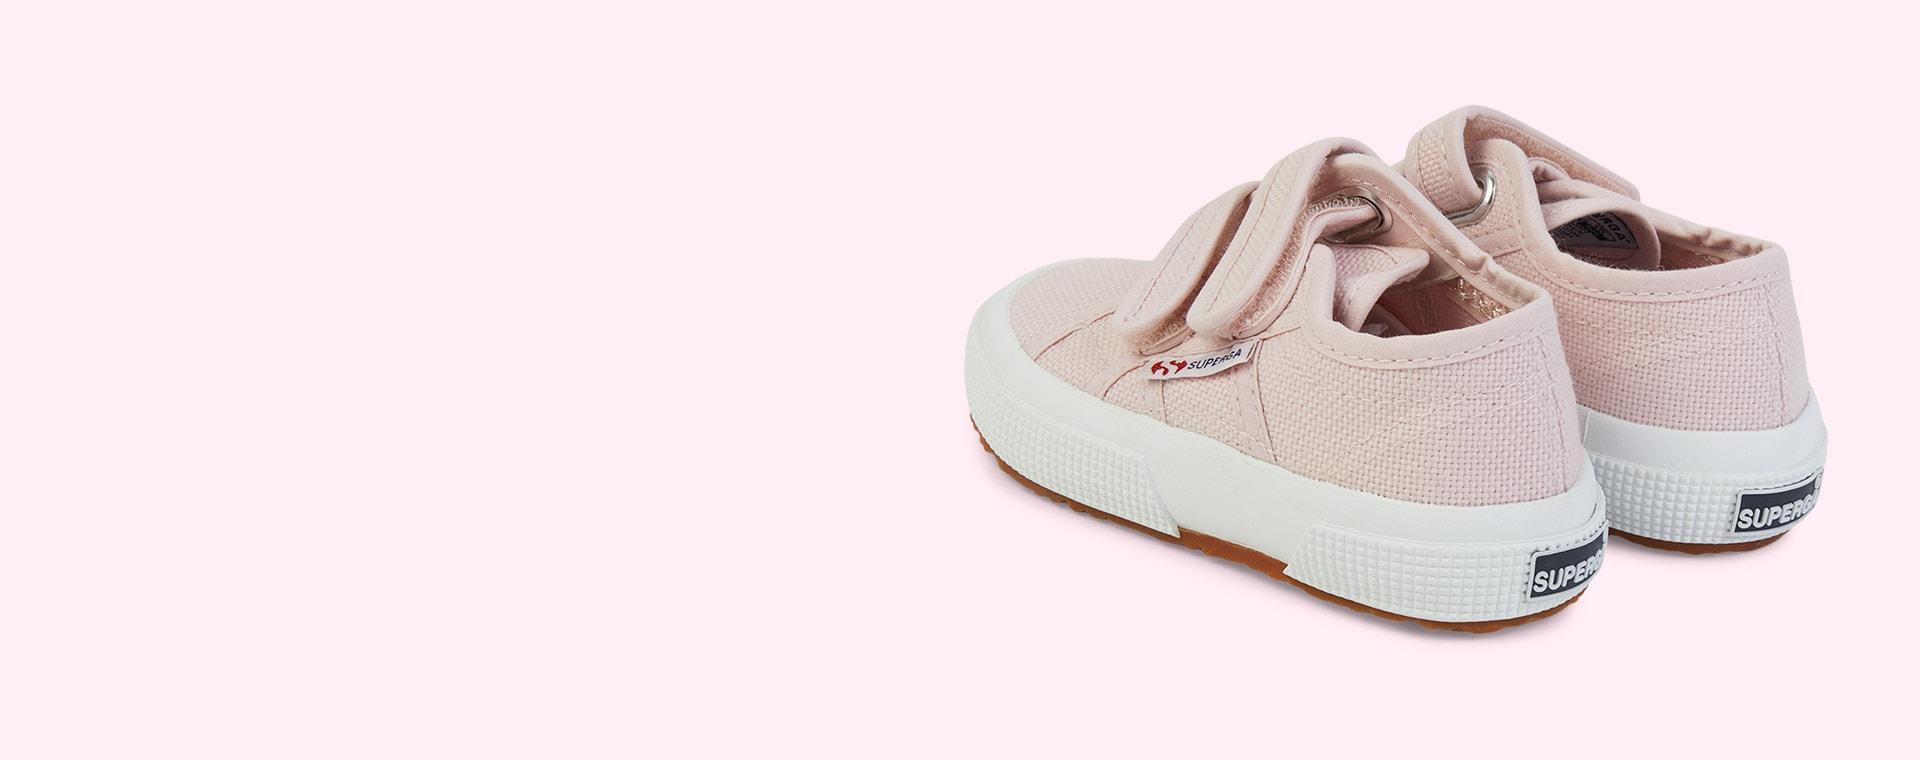 Pink Pale Lilac Superga JStrap Classic Kids